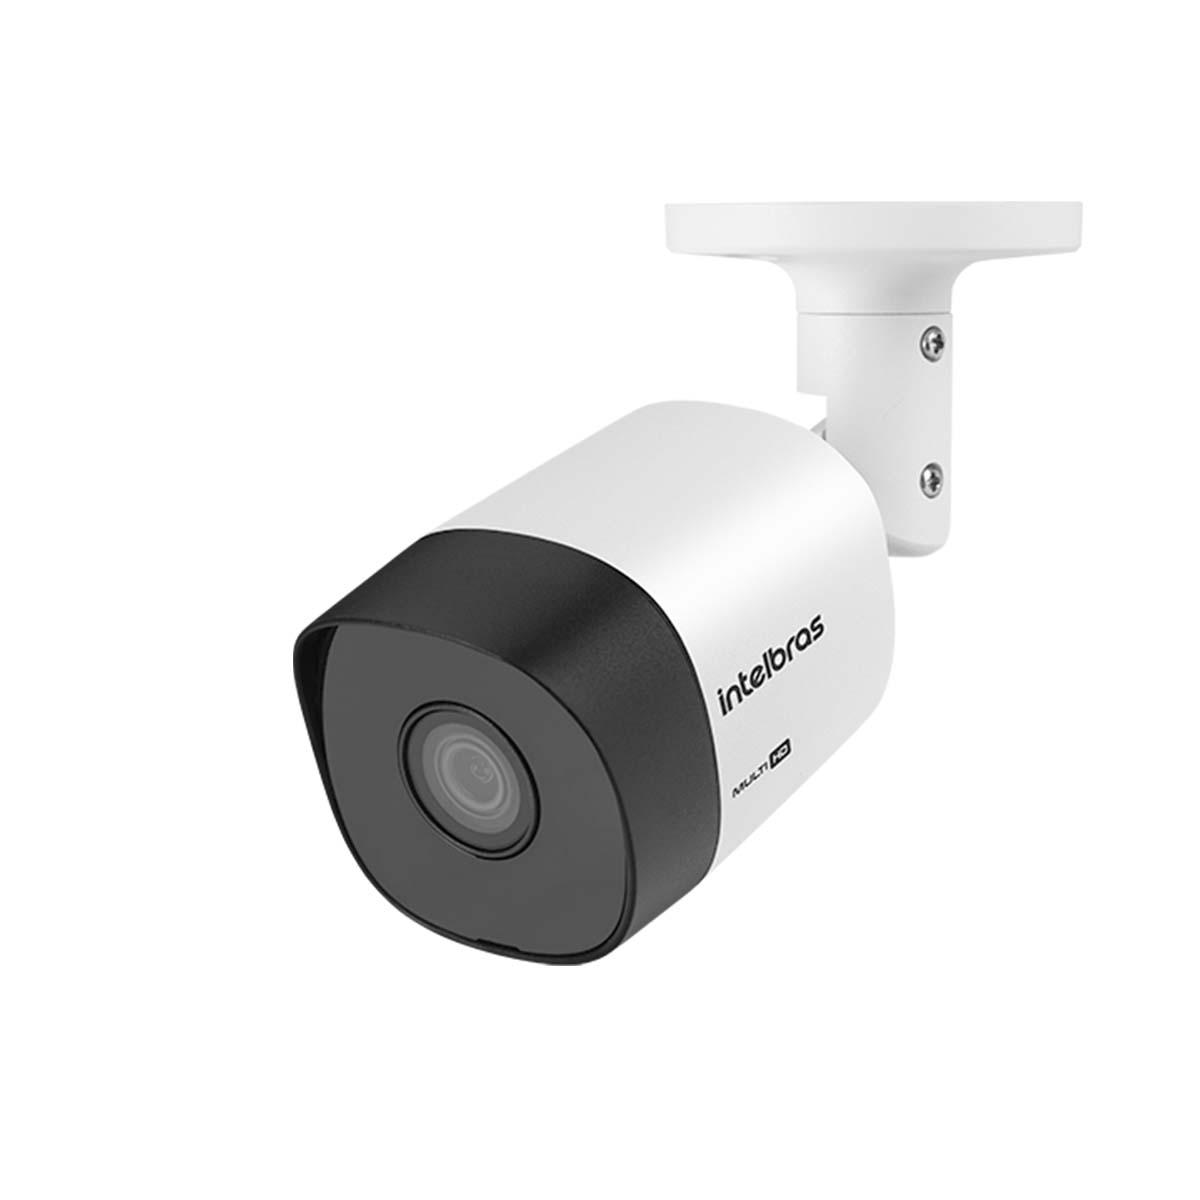 Kit 06 Câmera Bullet Intelbras Vhd 3120 B G6 720p 3,6mm